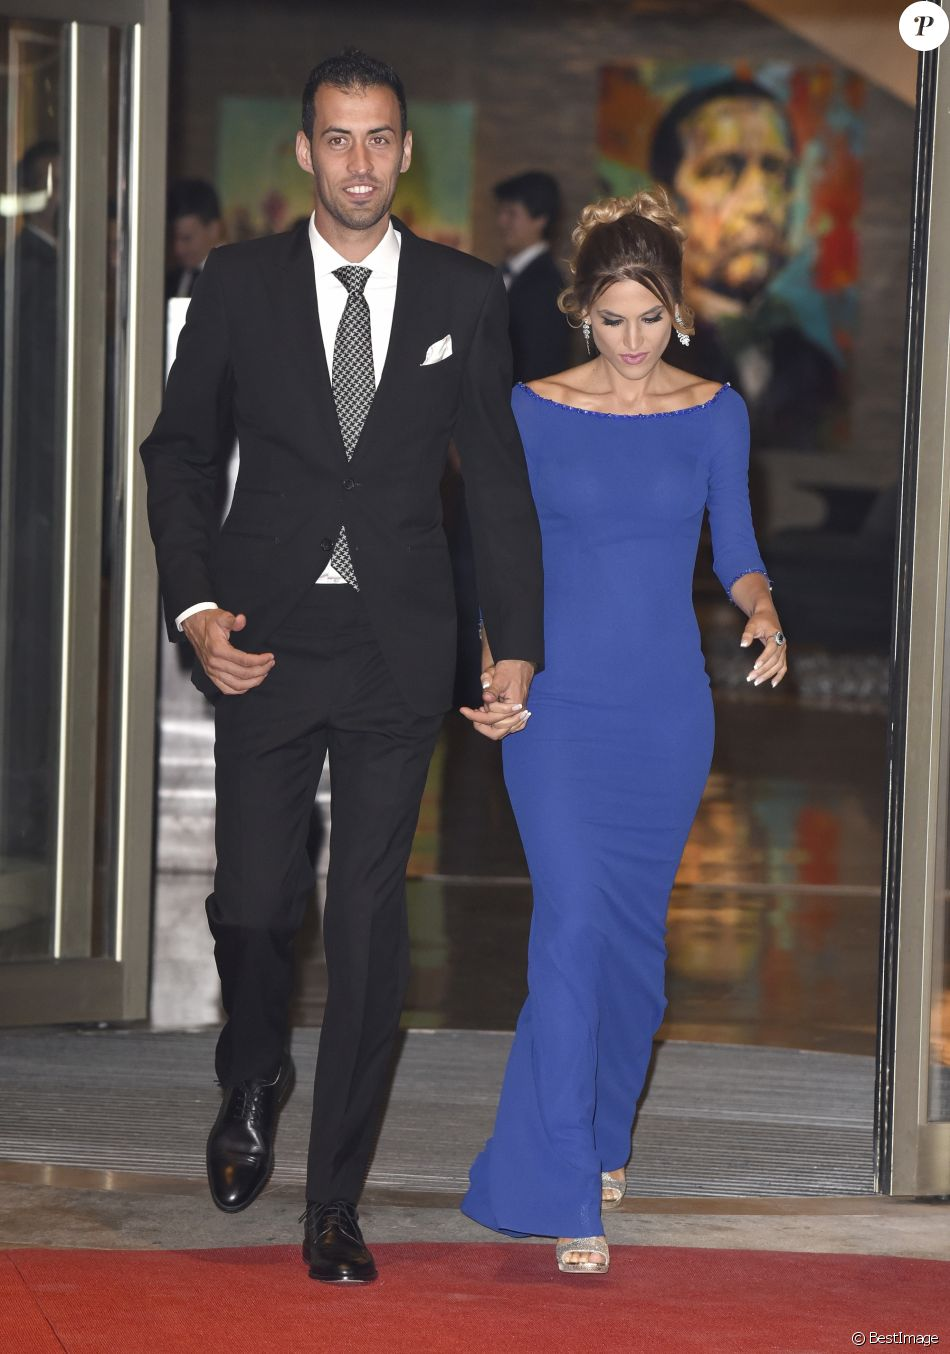 Sergio Busquets et sa compagne Elena Galera au mariage de Lionel Messi et  Antonella Roccuzzo au Pullman City Center de Rosario en Argentine le 30  juin 2017.